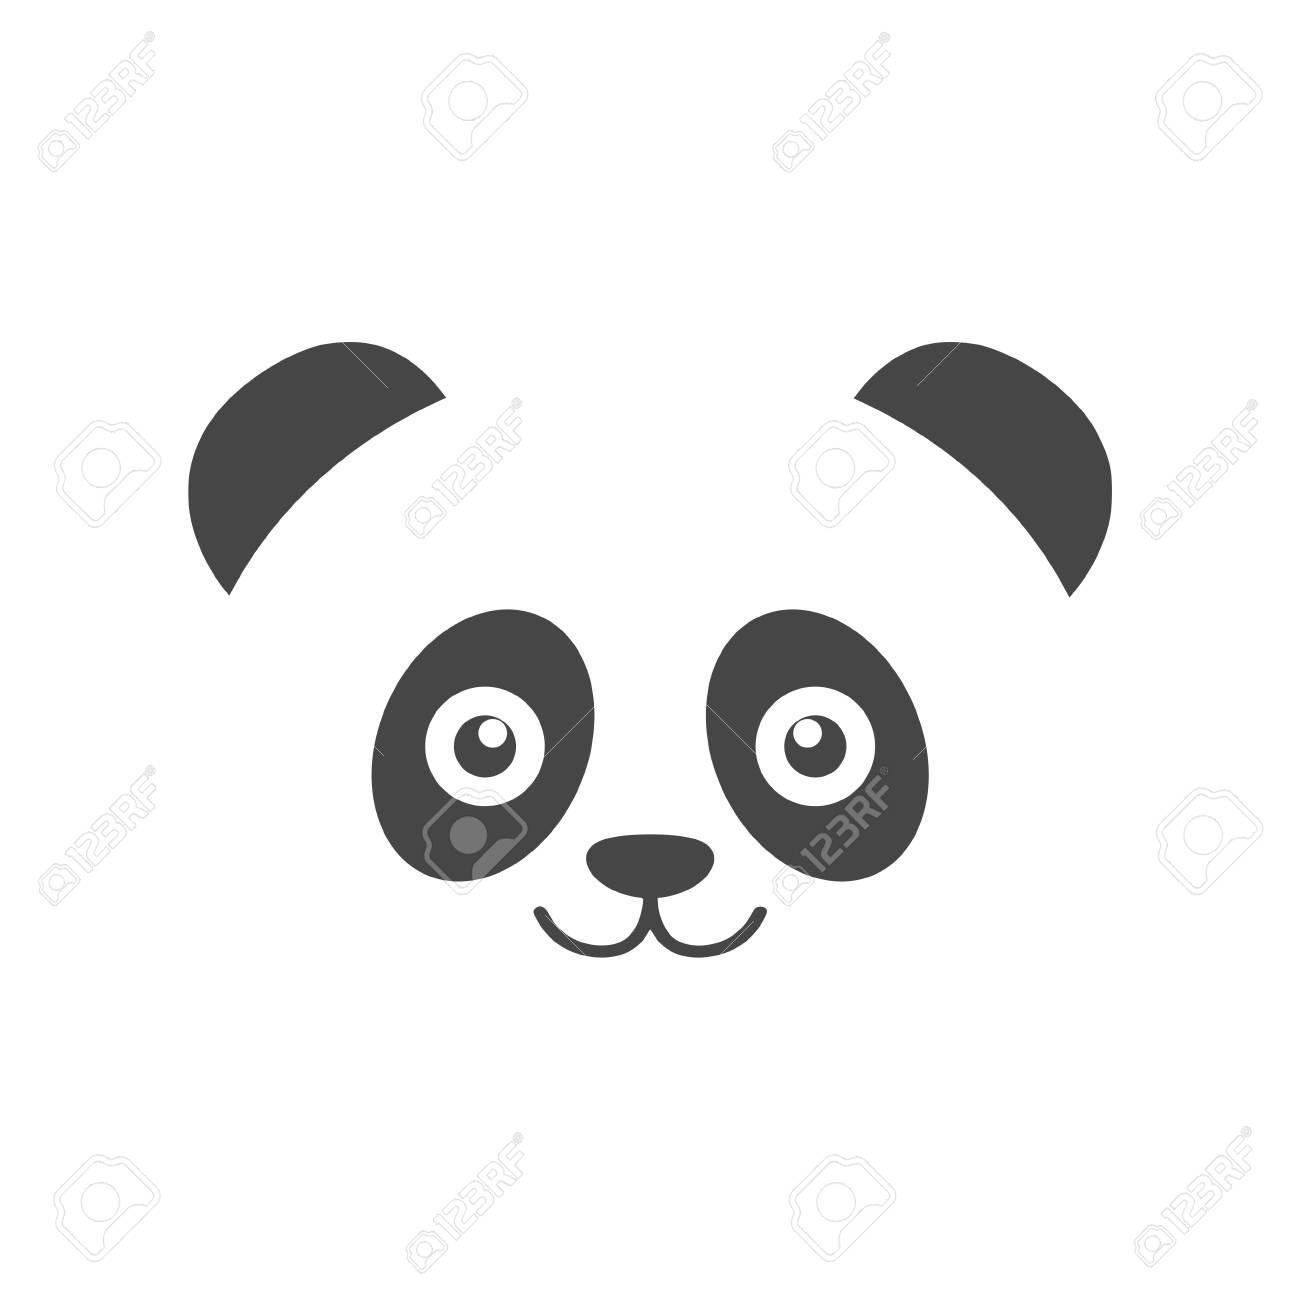 Icone De Tete De Panda Illustration Vectorielle Illustration